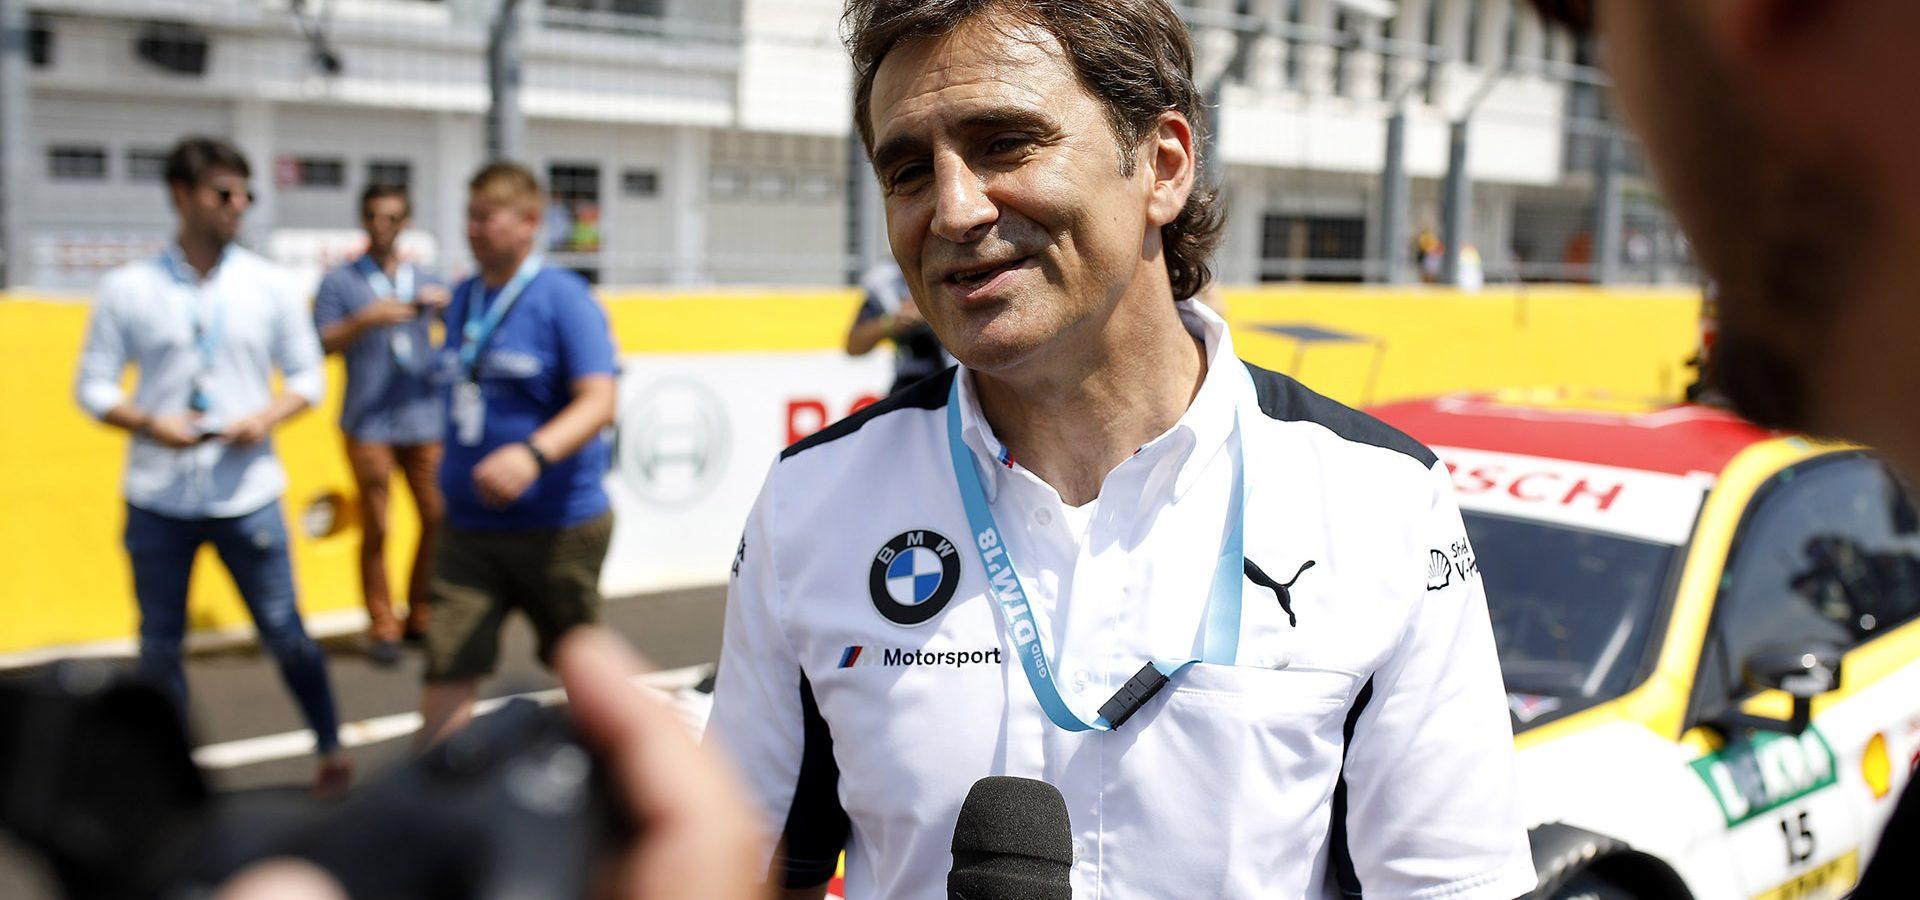 Hungaroring (HUN) 2nd June 2018. BMW M Motorsport, DTM, Round 3, Alessandro Zanardi (ITA), BMW works driver and BMW brand ambassador